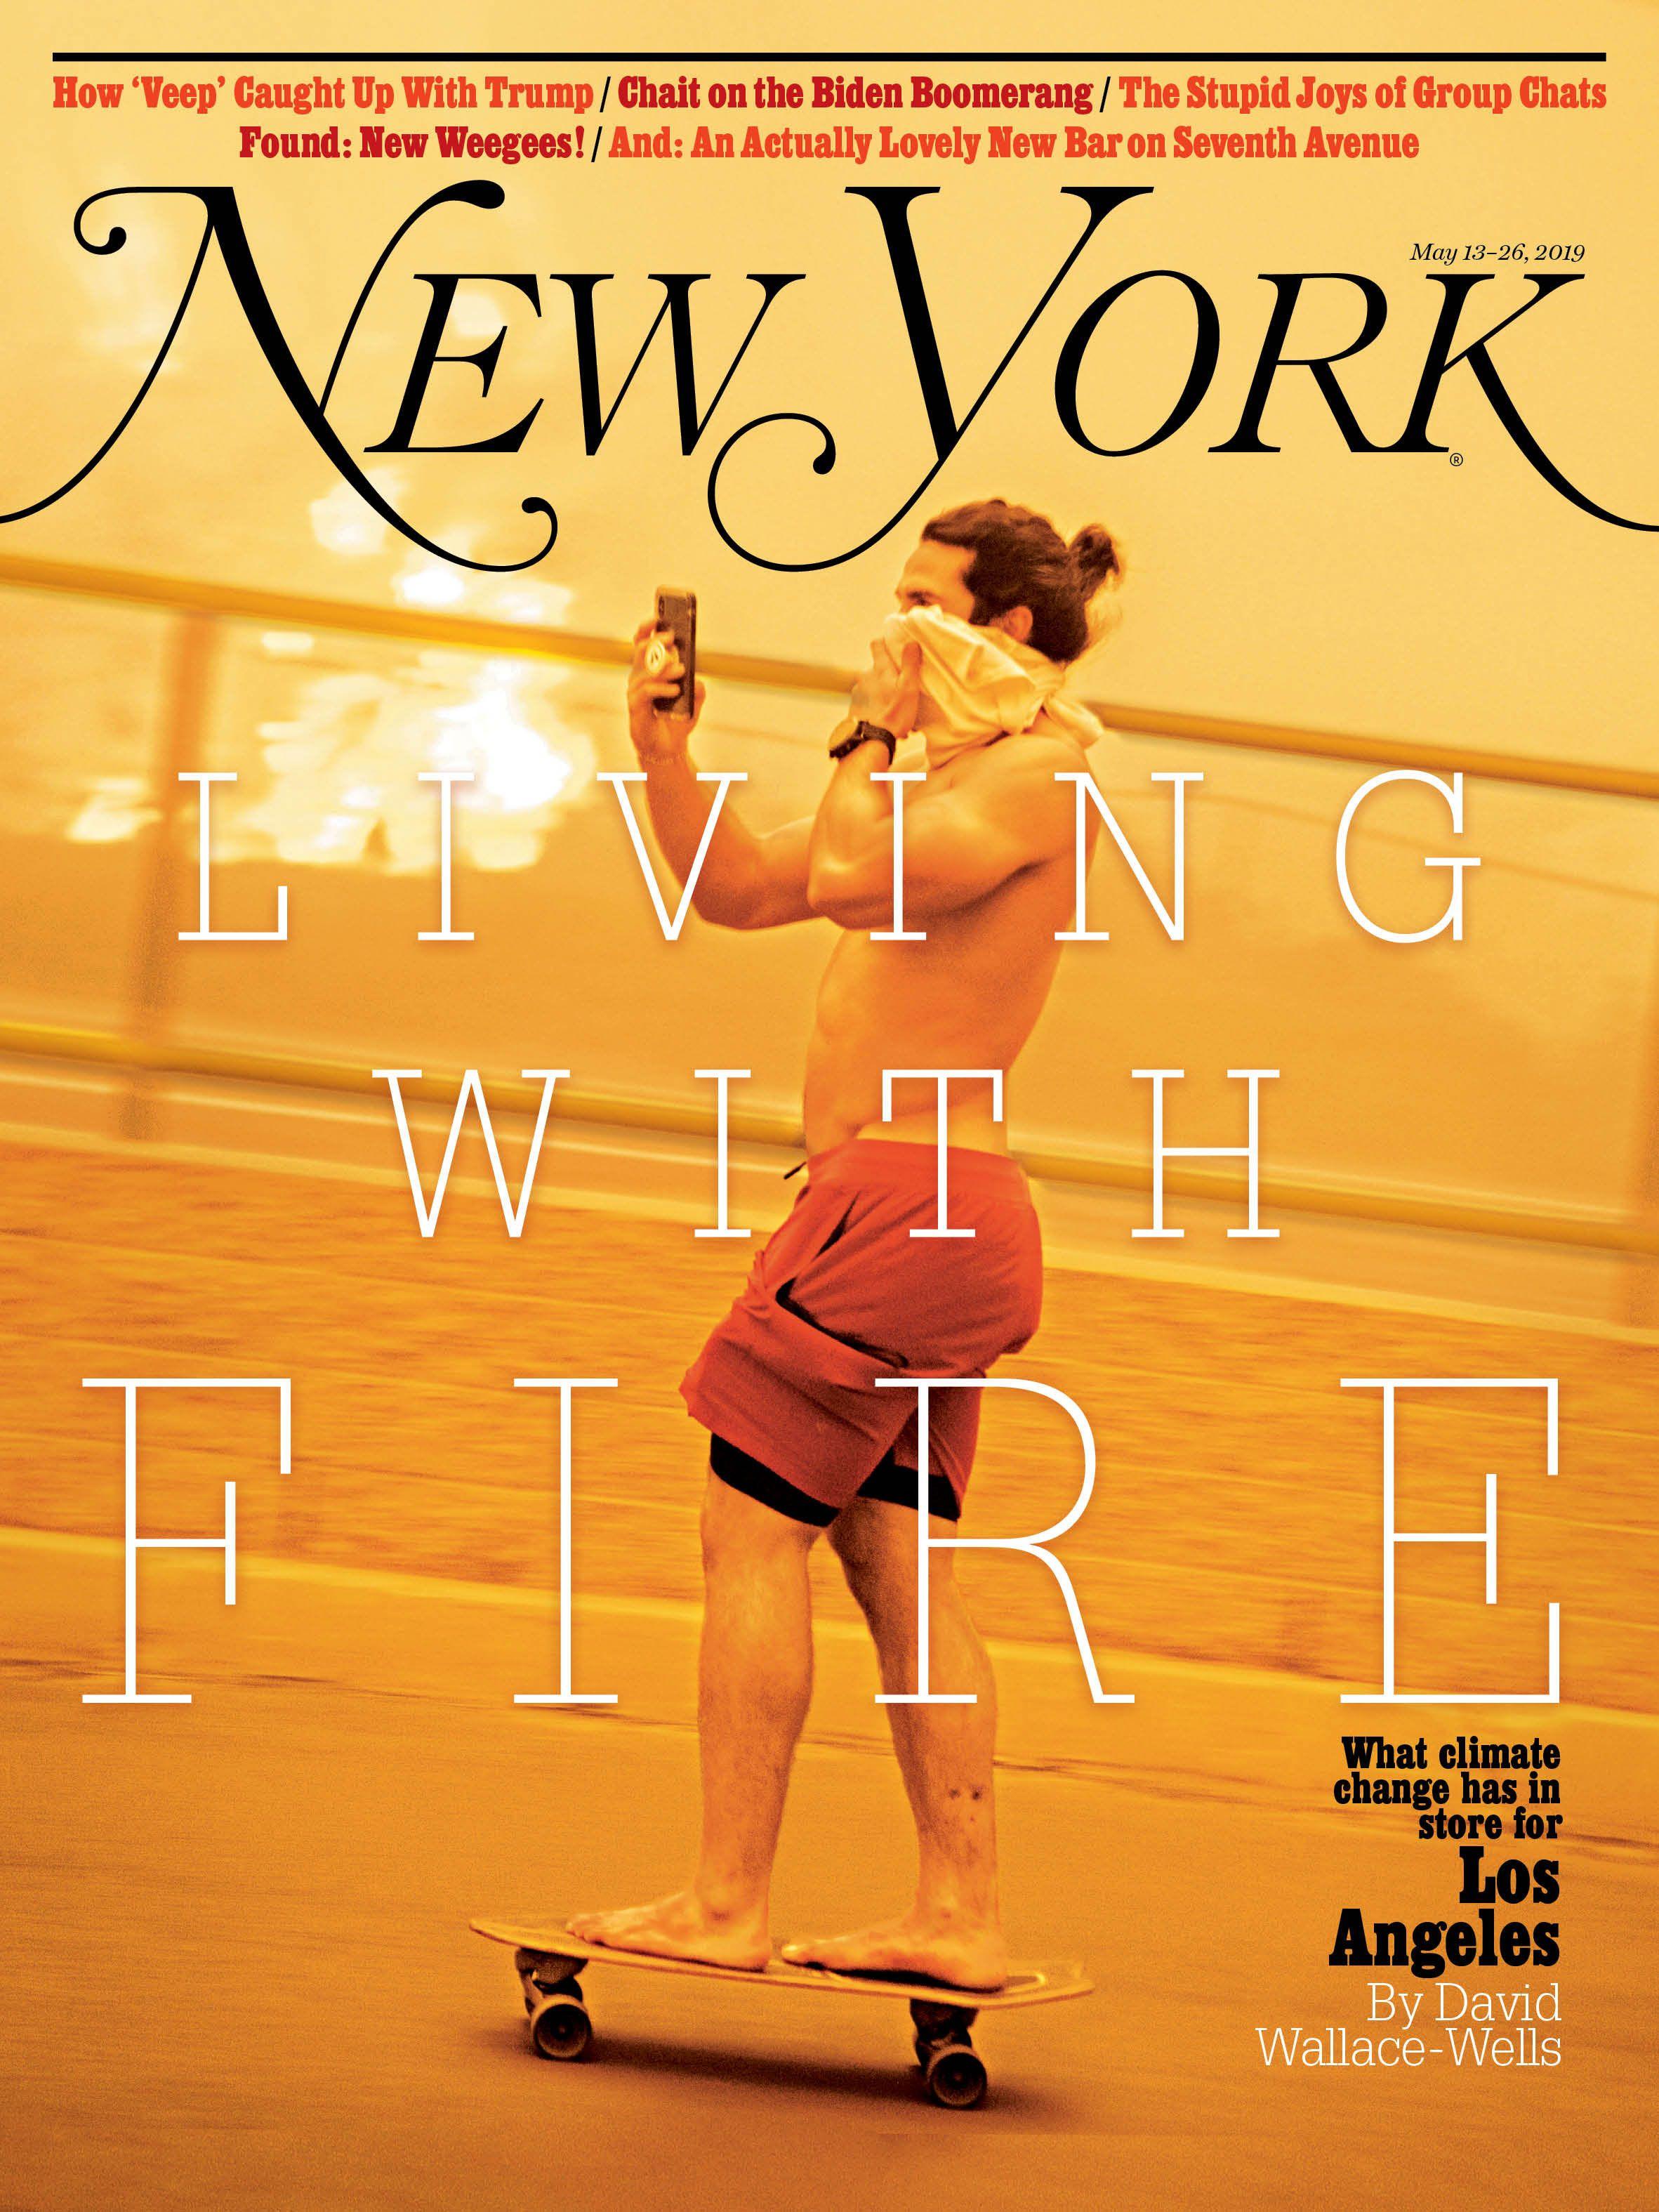 New York Magazine Best Doctors 2020 New York Magazine: May 13, 2019 Issue